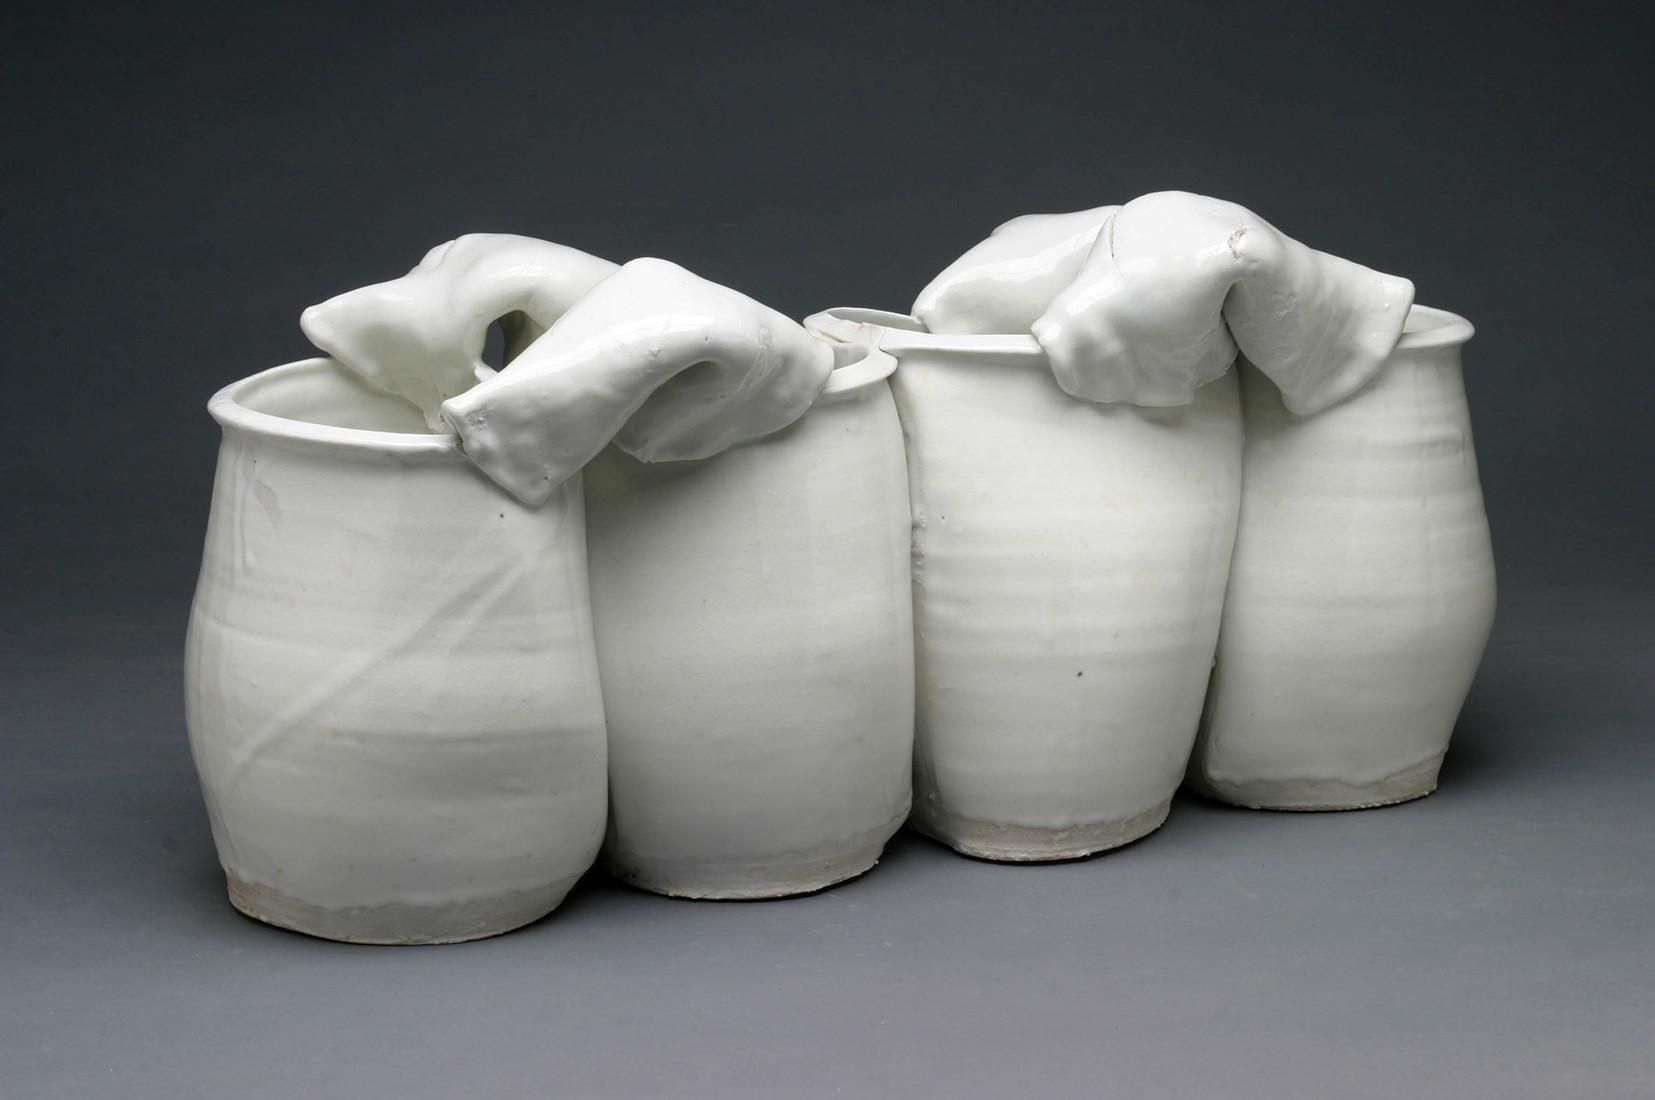 white ceramic round vase of david kordansky gallery for joined vases 1972 porcelain 10 x 23 x 11 1 2 inches 25 4 x 58 4 x 29 2 cm